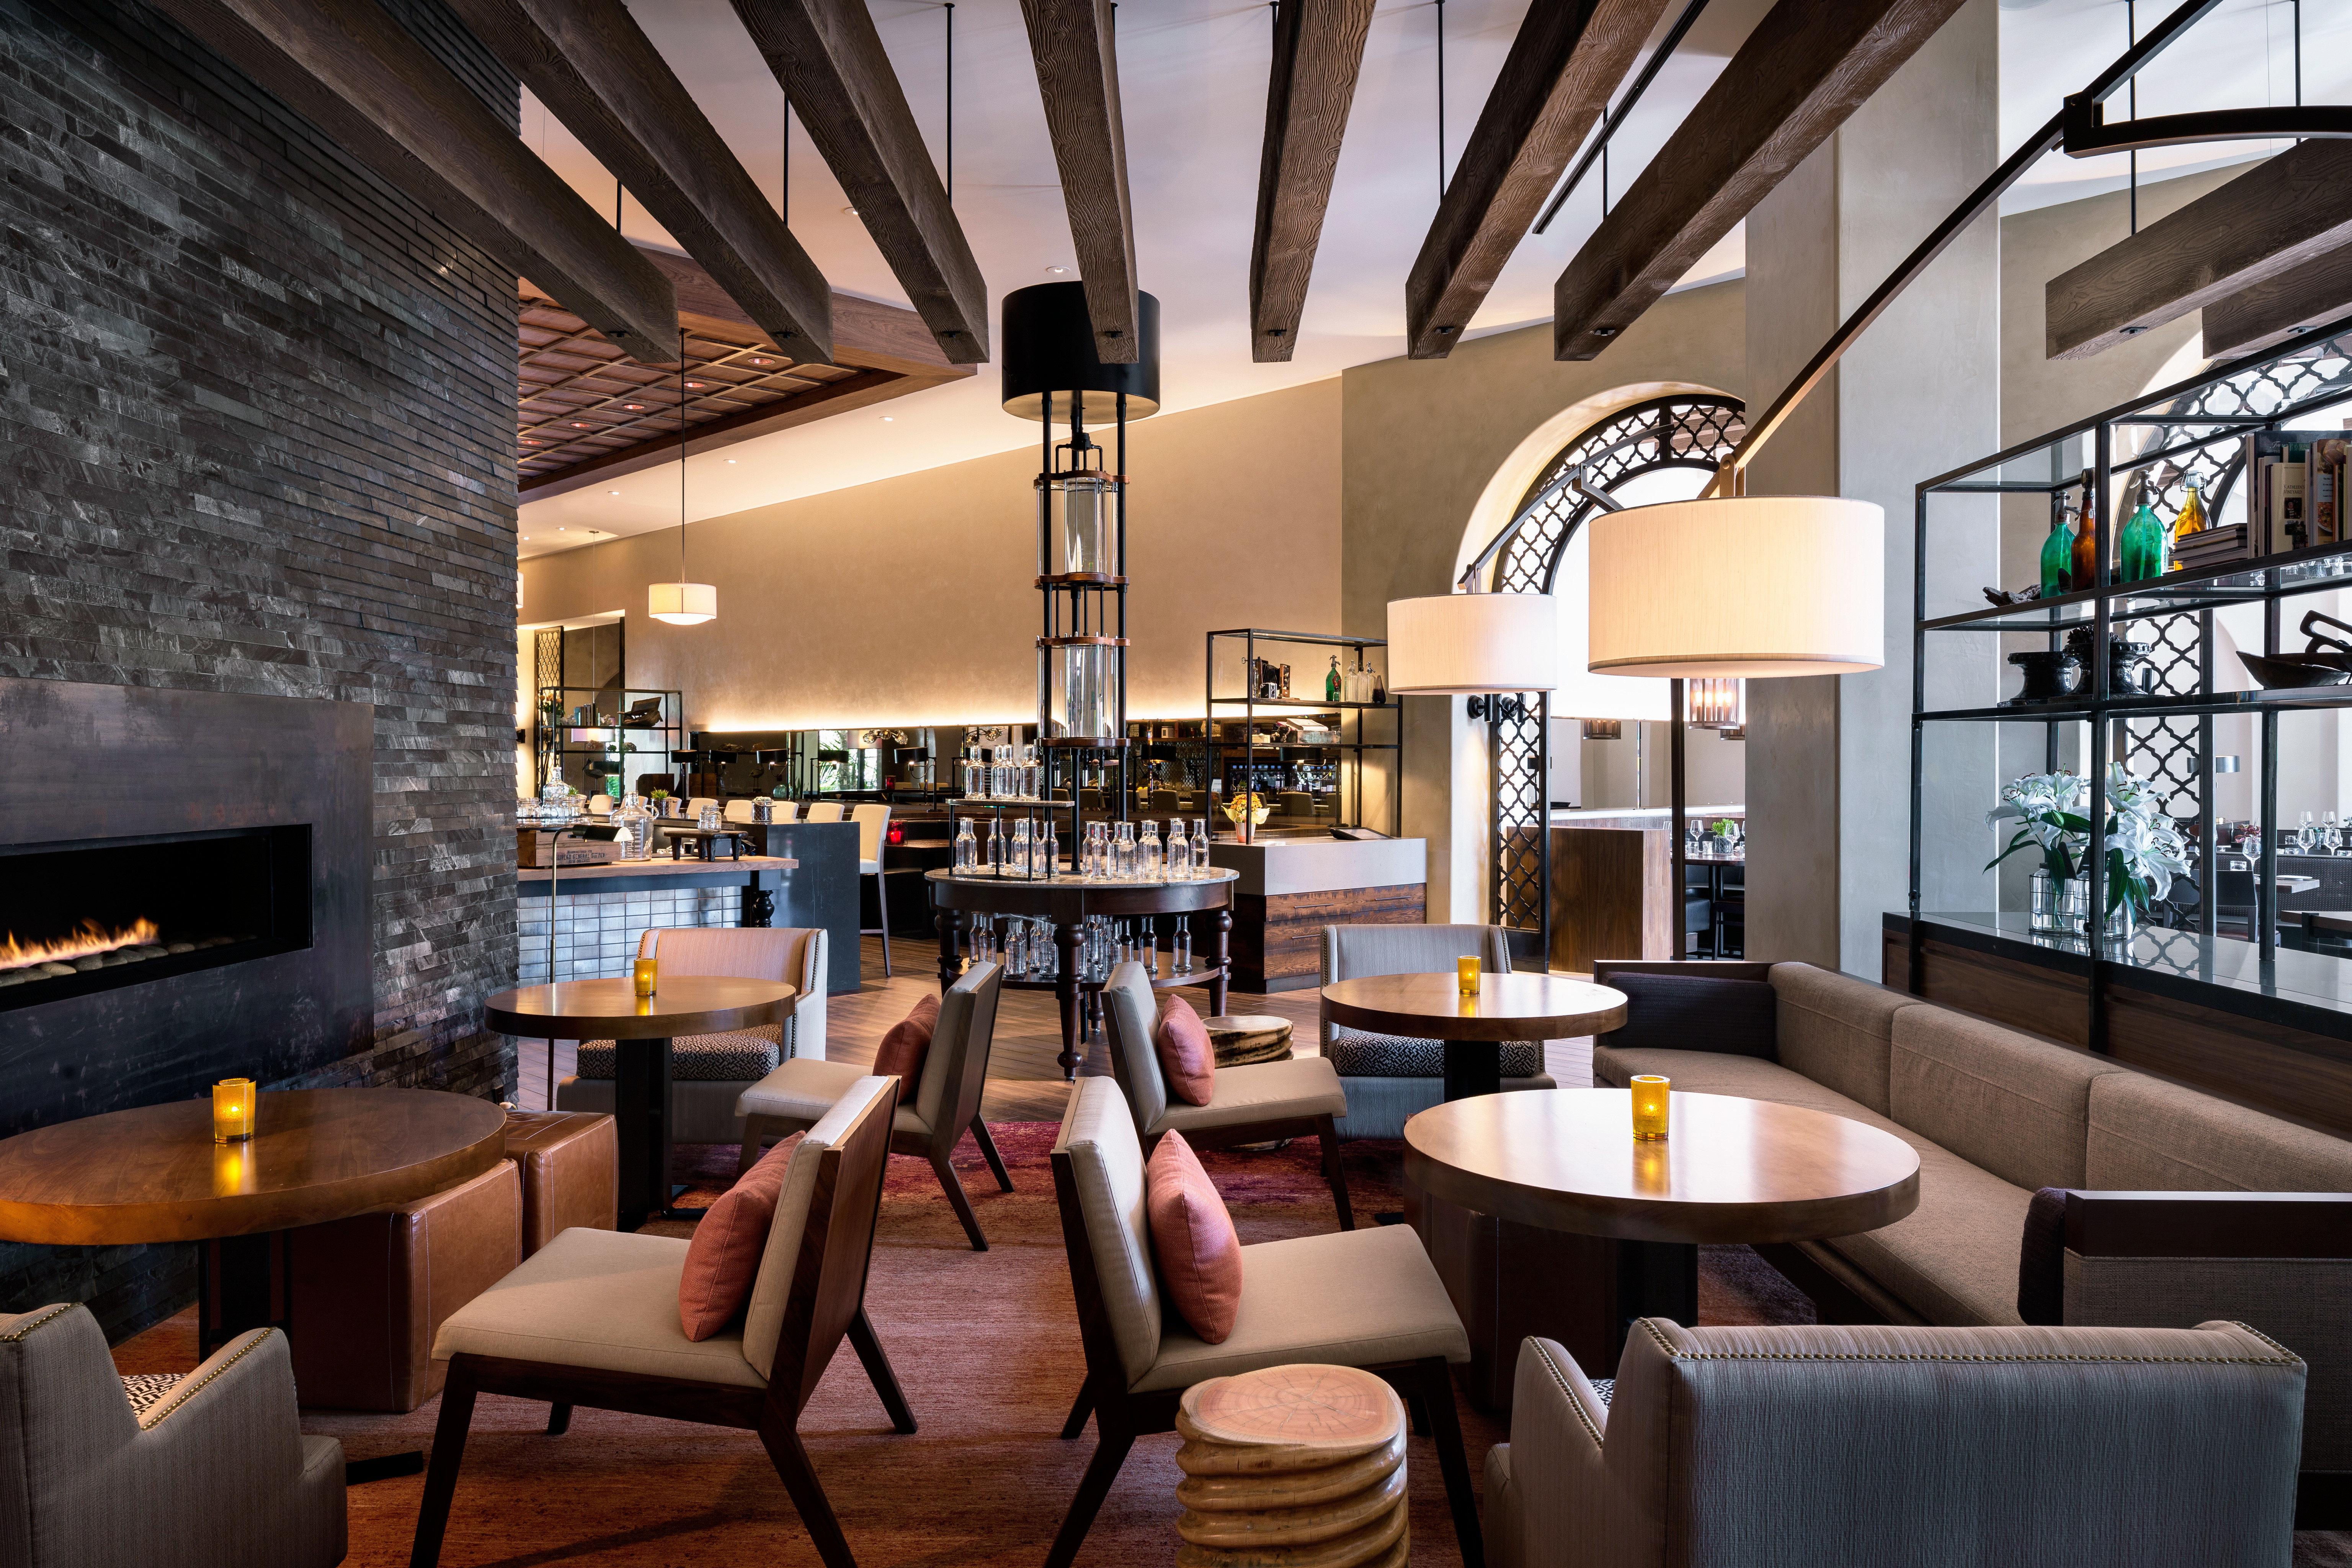 chair property Lobby restaurant living room Bar dining table